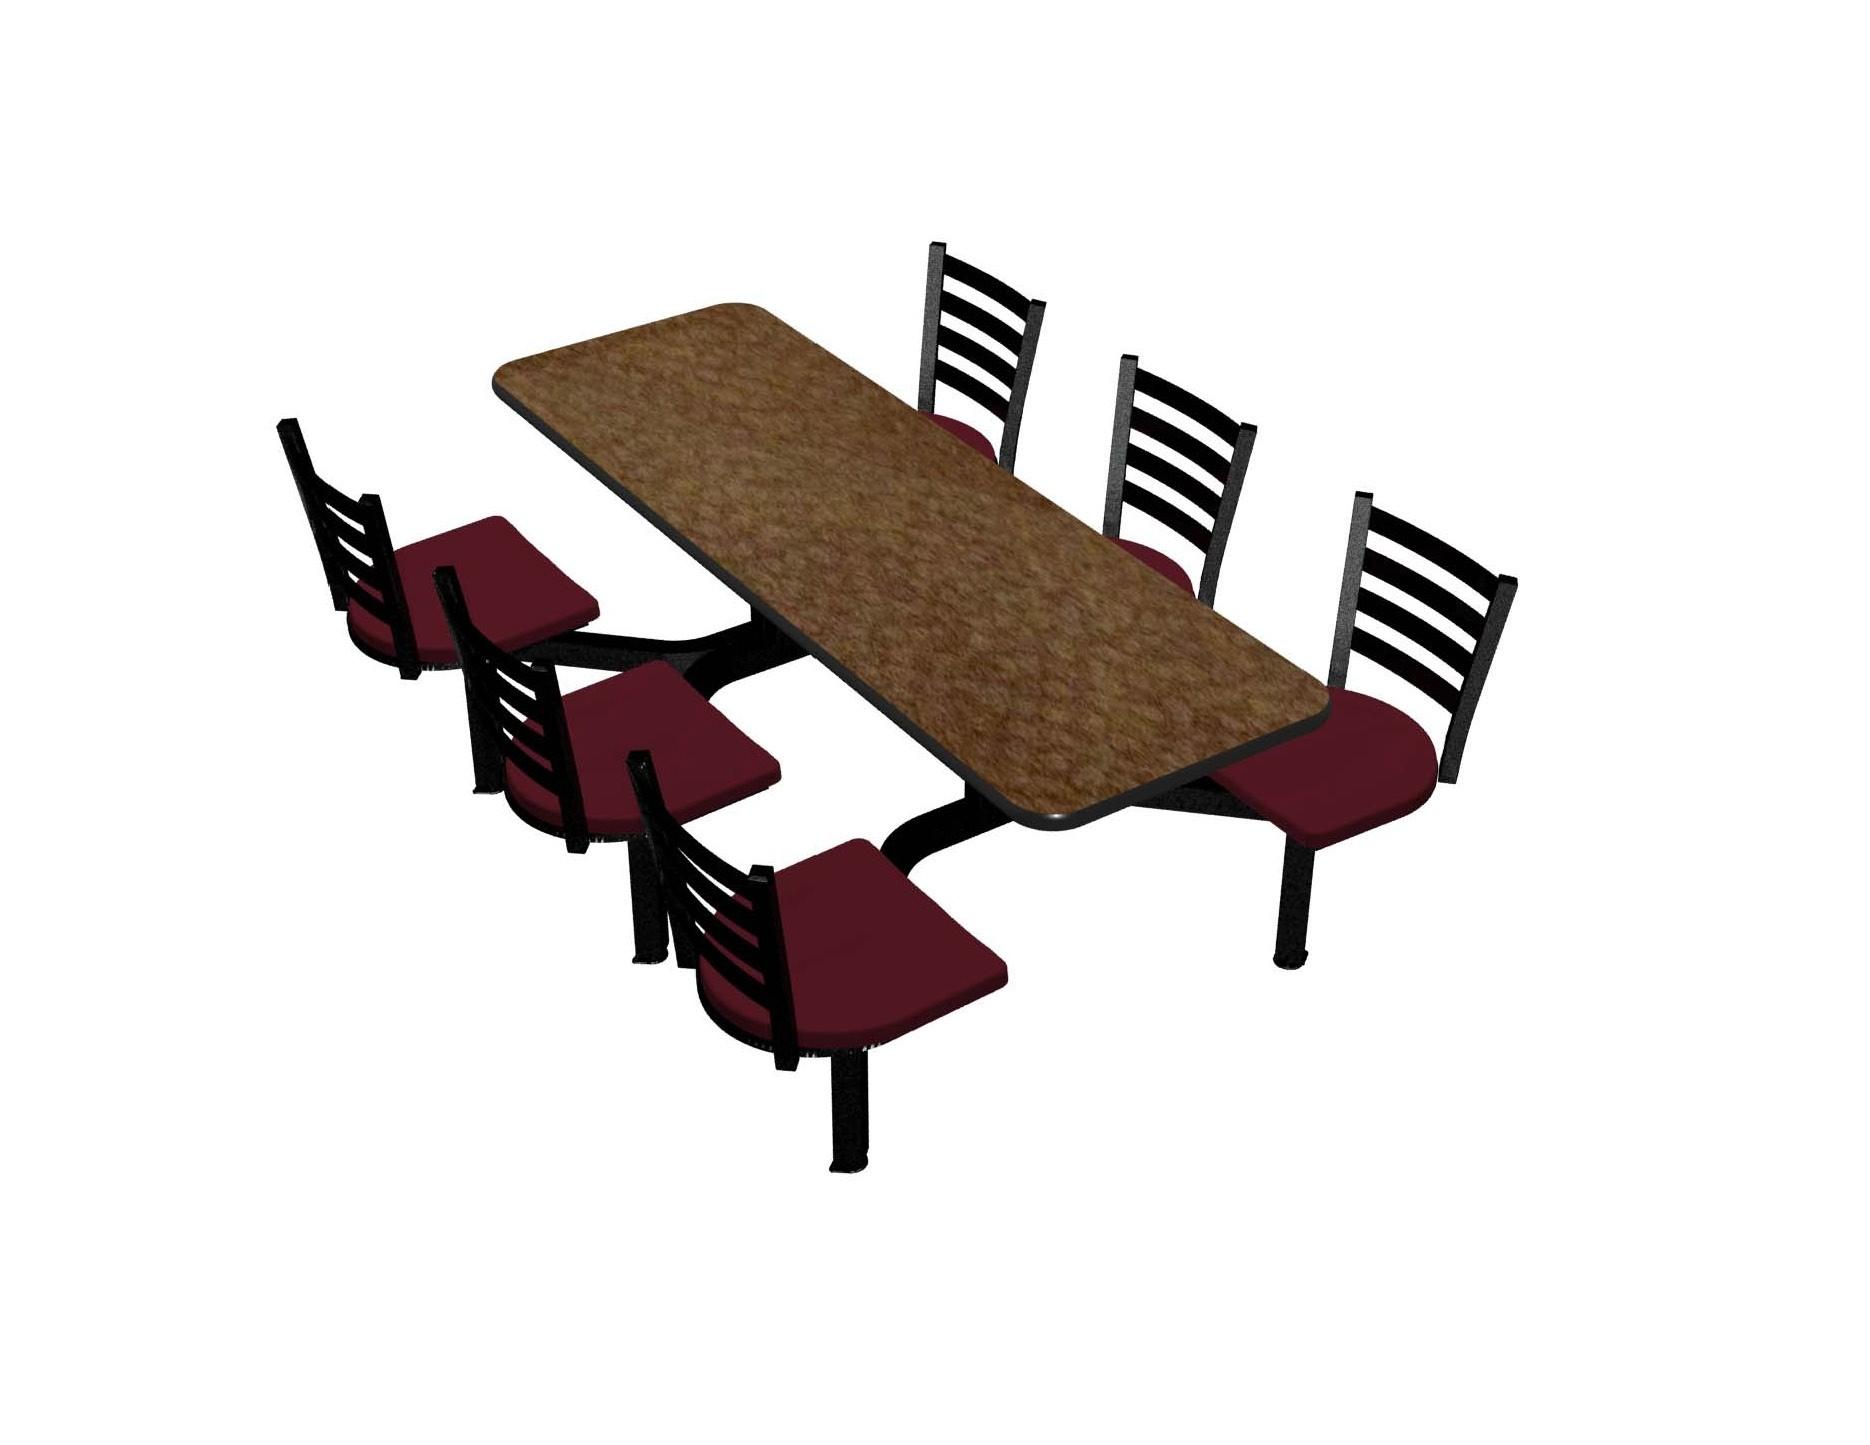 Windswept Bronze laminate table, Black vinyl edge, Encore chairhead with Burgundy seat